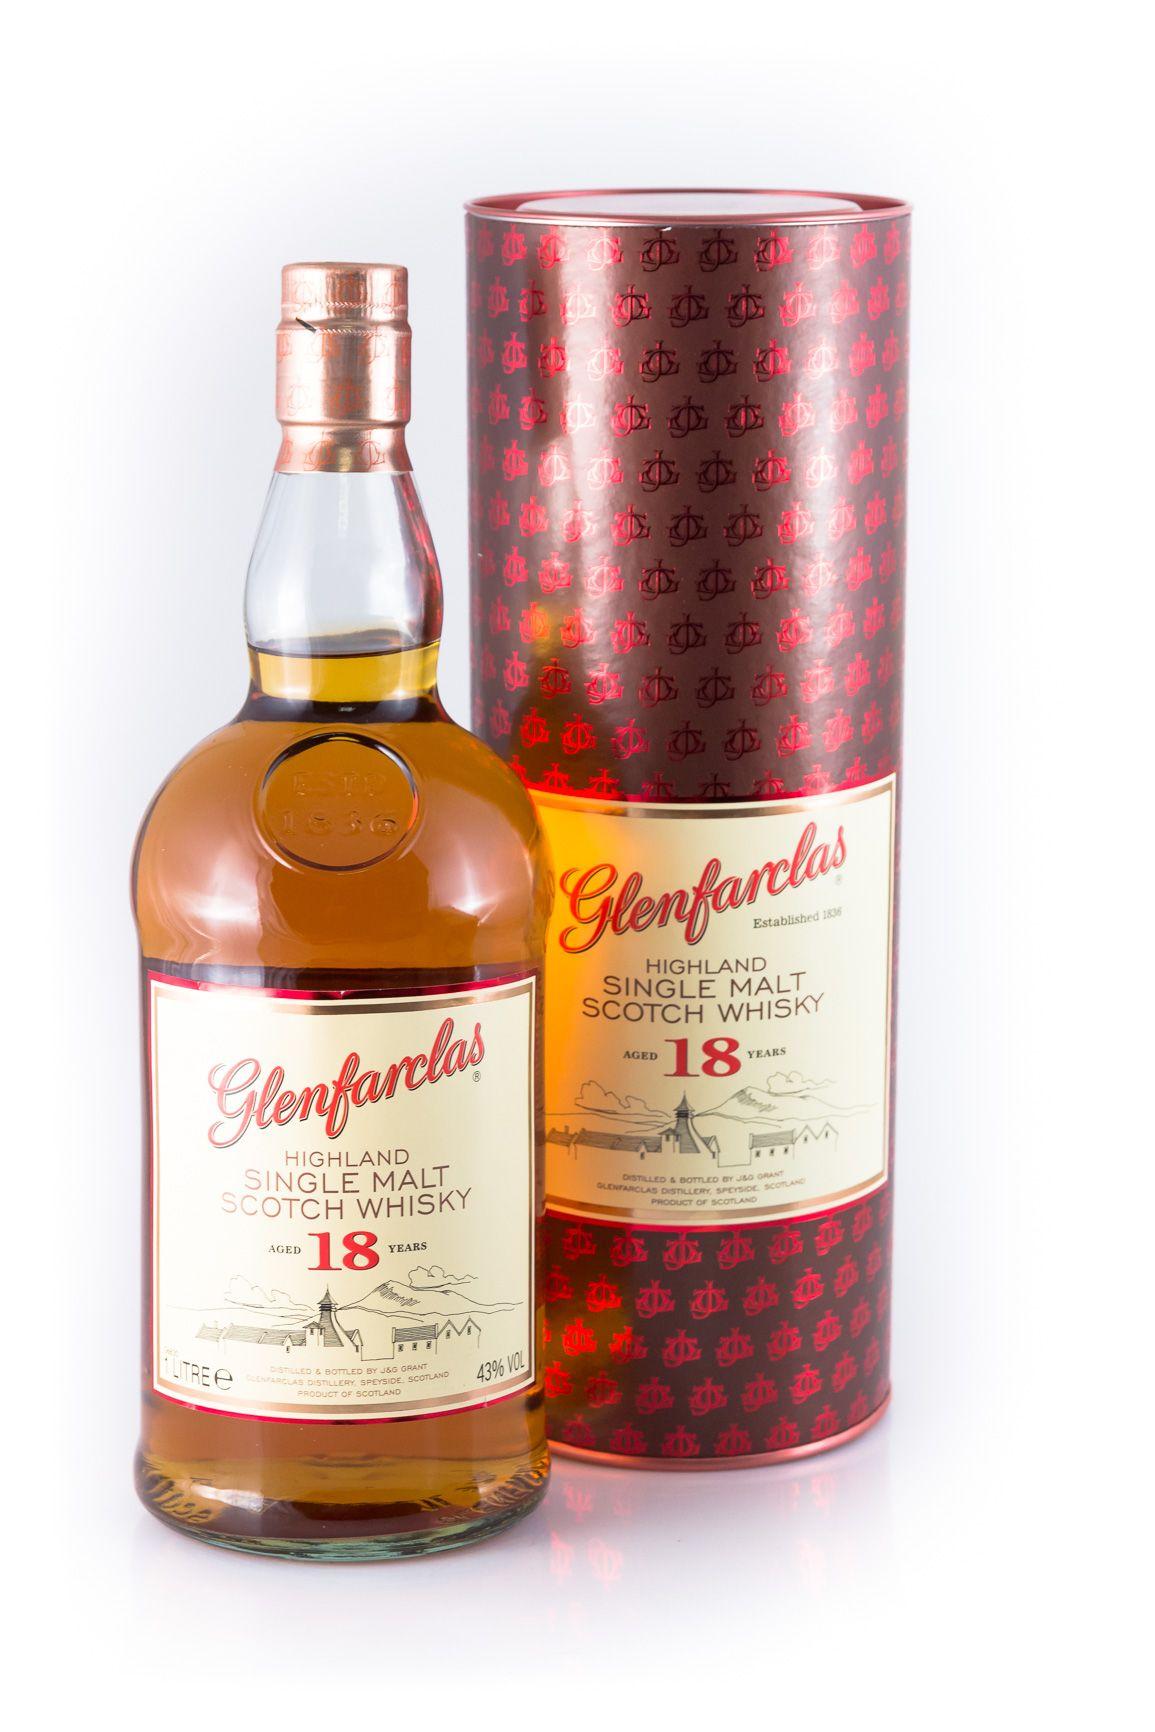 [Drankdozijn] Glenfarclas 18 Single Malt Scotch Whisky 43% 1,0l Flasche